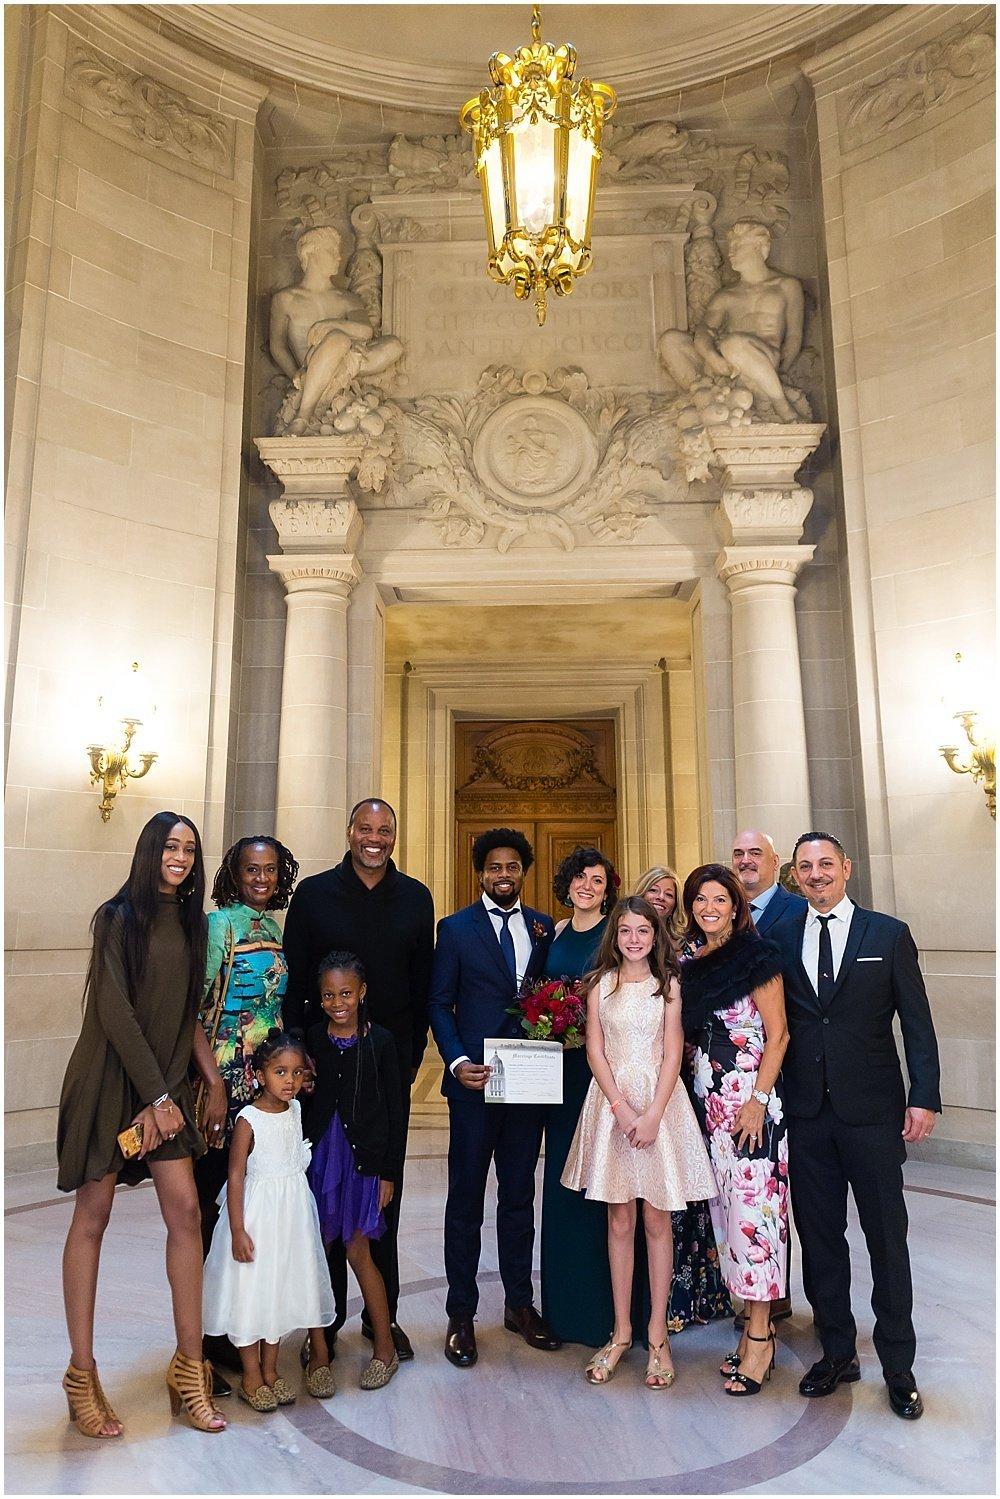 Group photo at San Francisco City Hall Wedding by chloe jackman photography